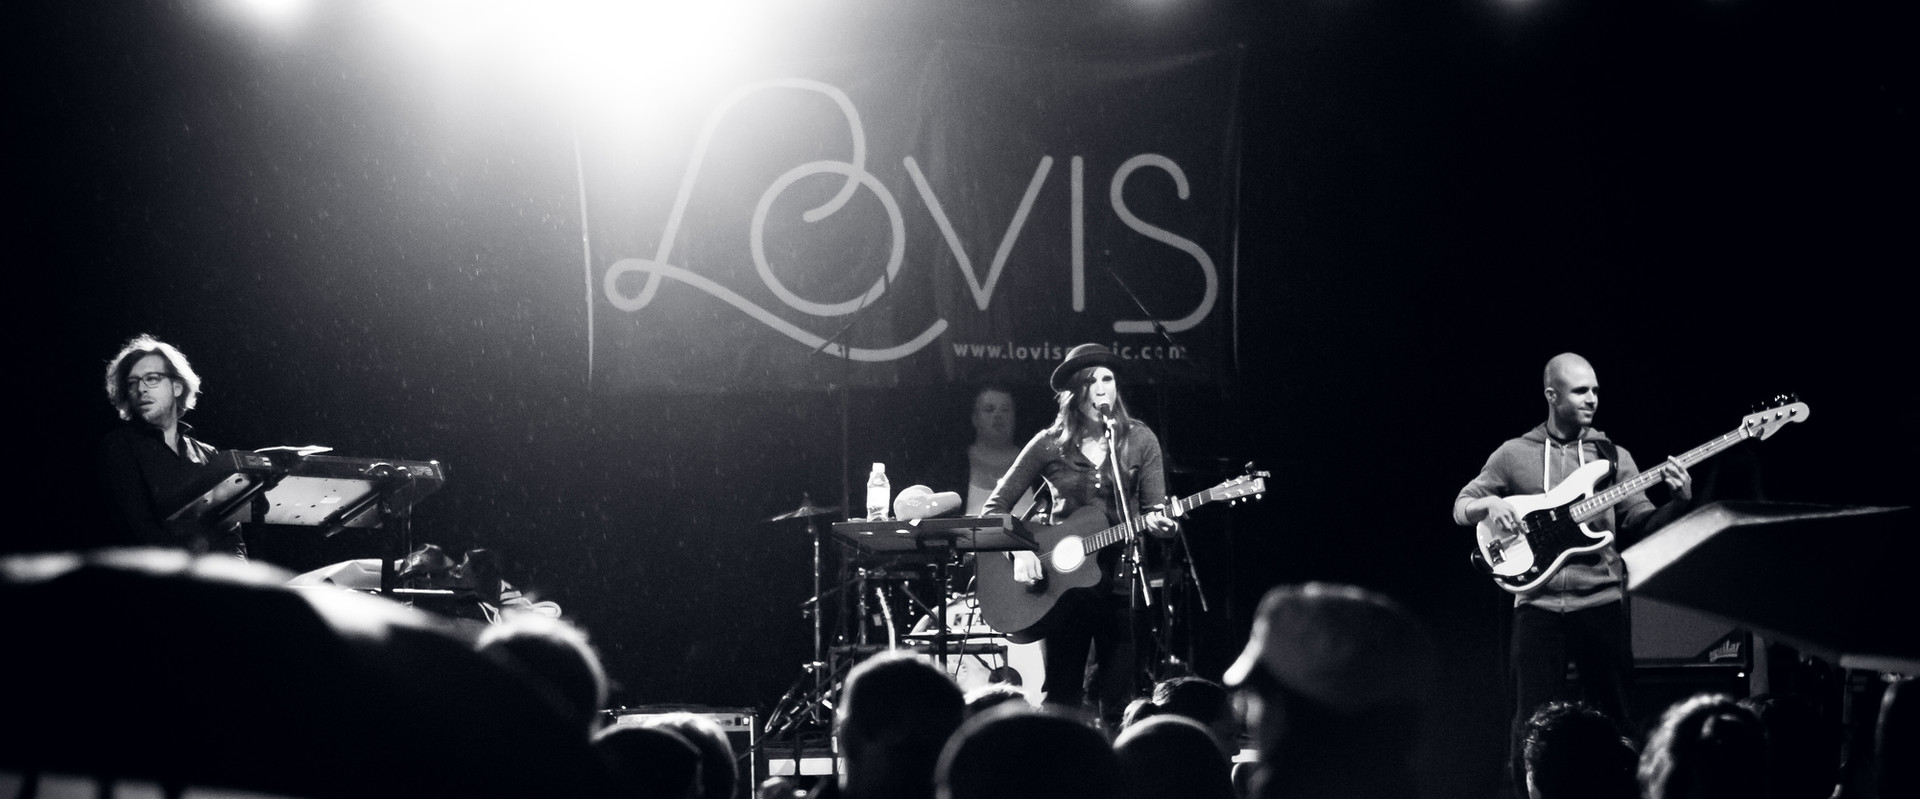 2015.08.13_Lovis Gaywest Konzert_561.jpg